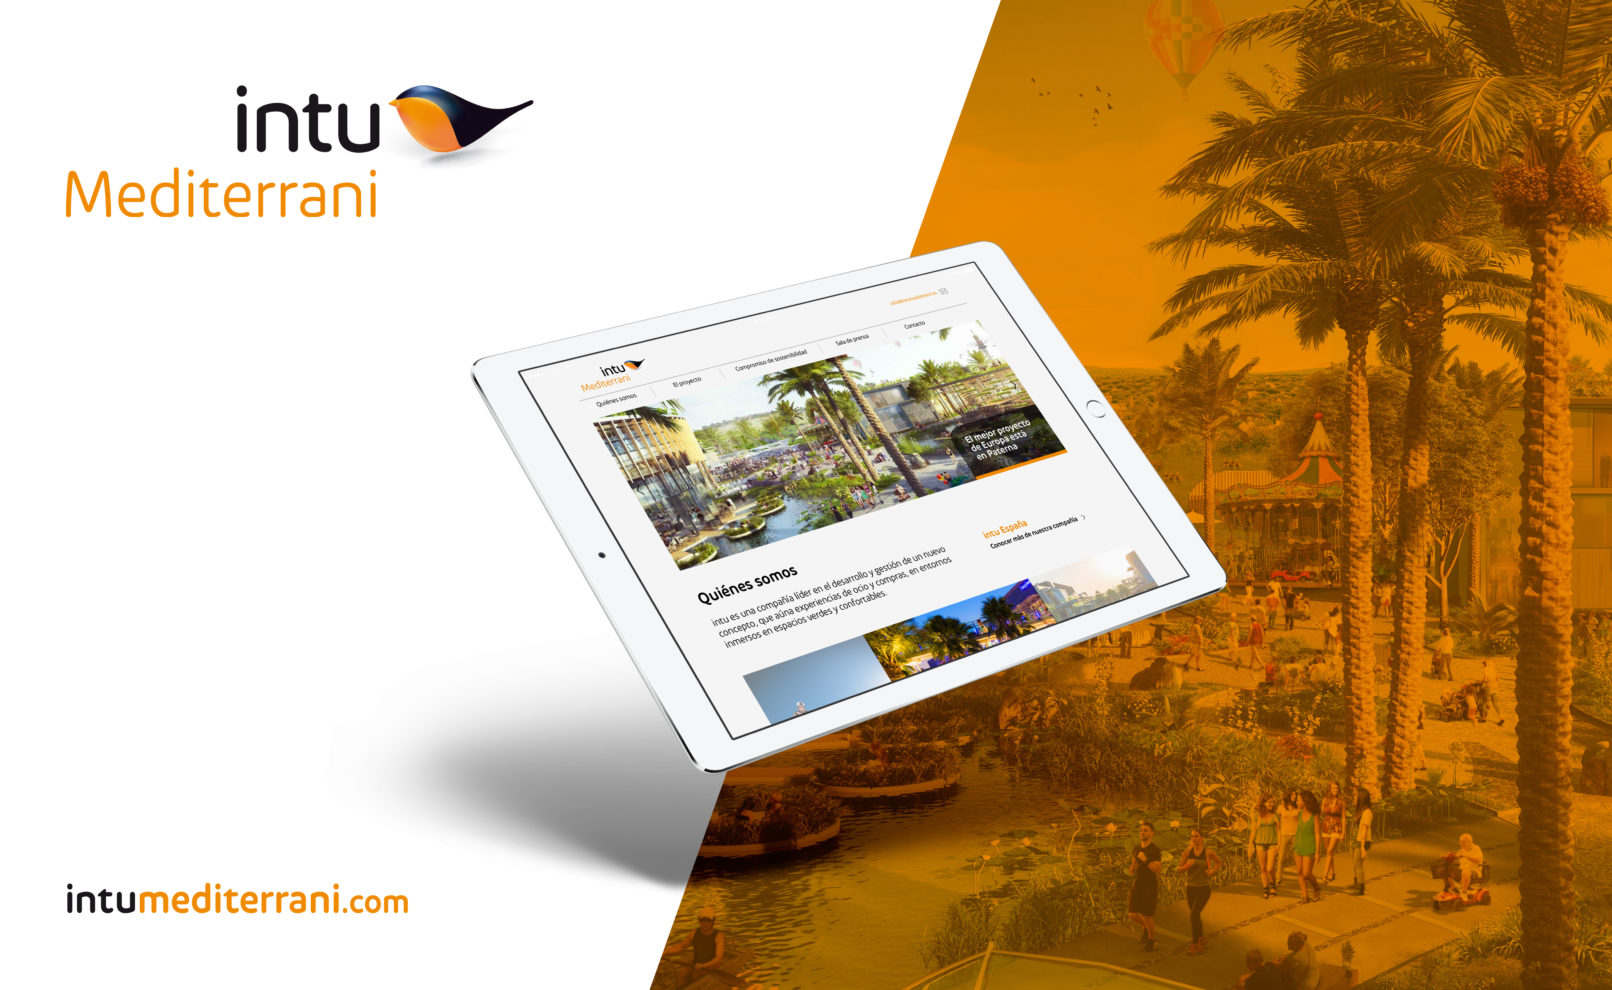 intu-mediterrani-web